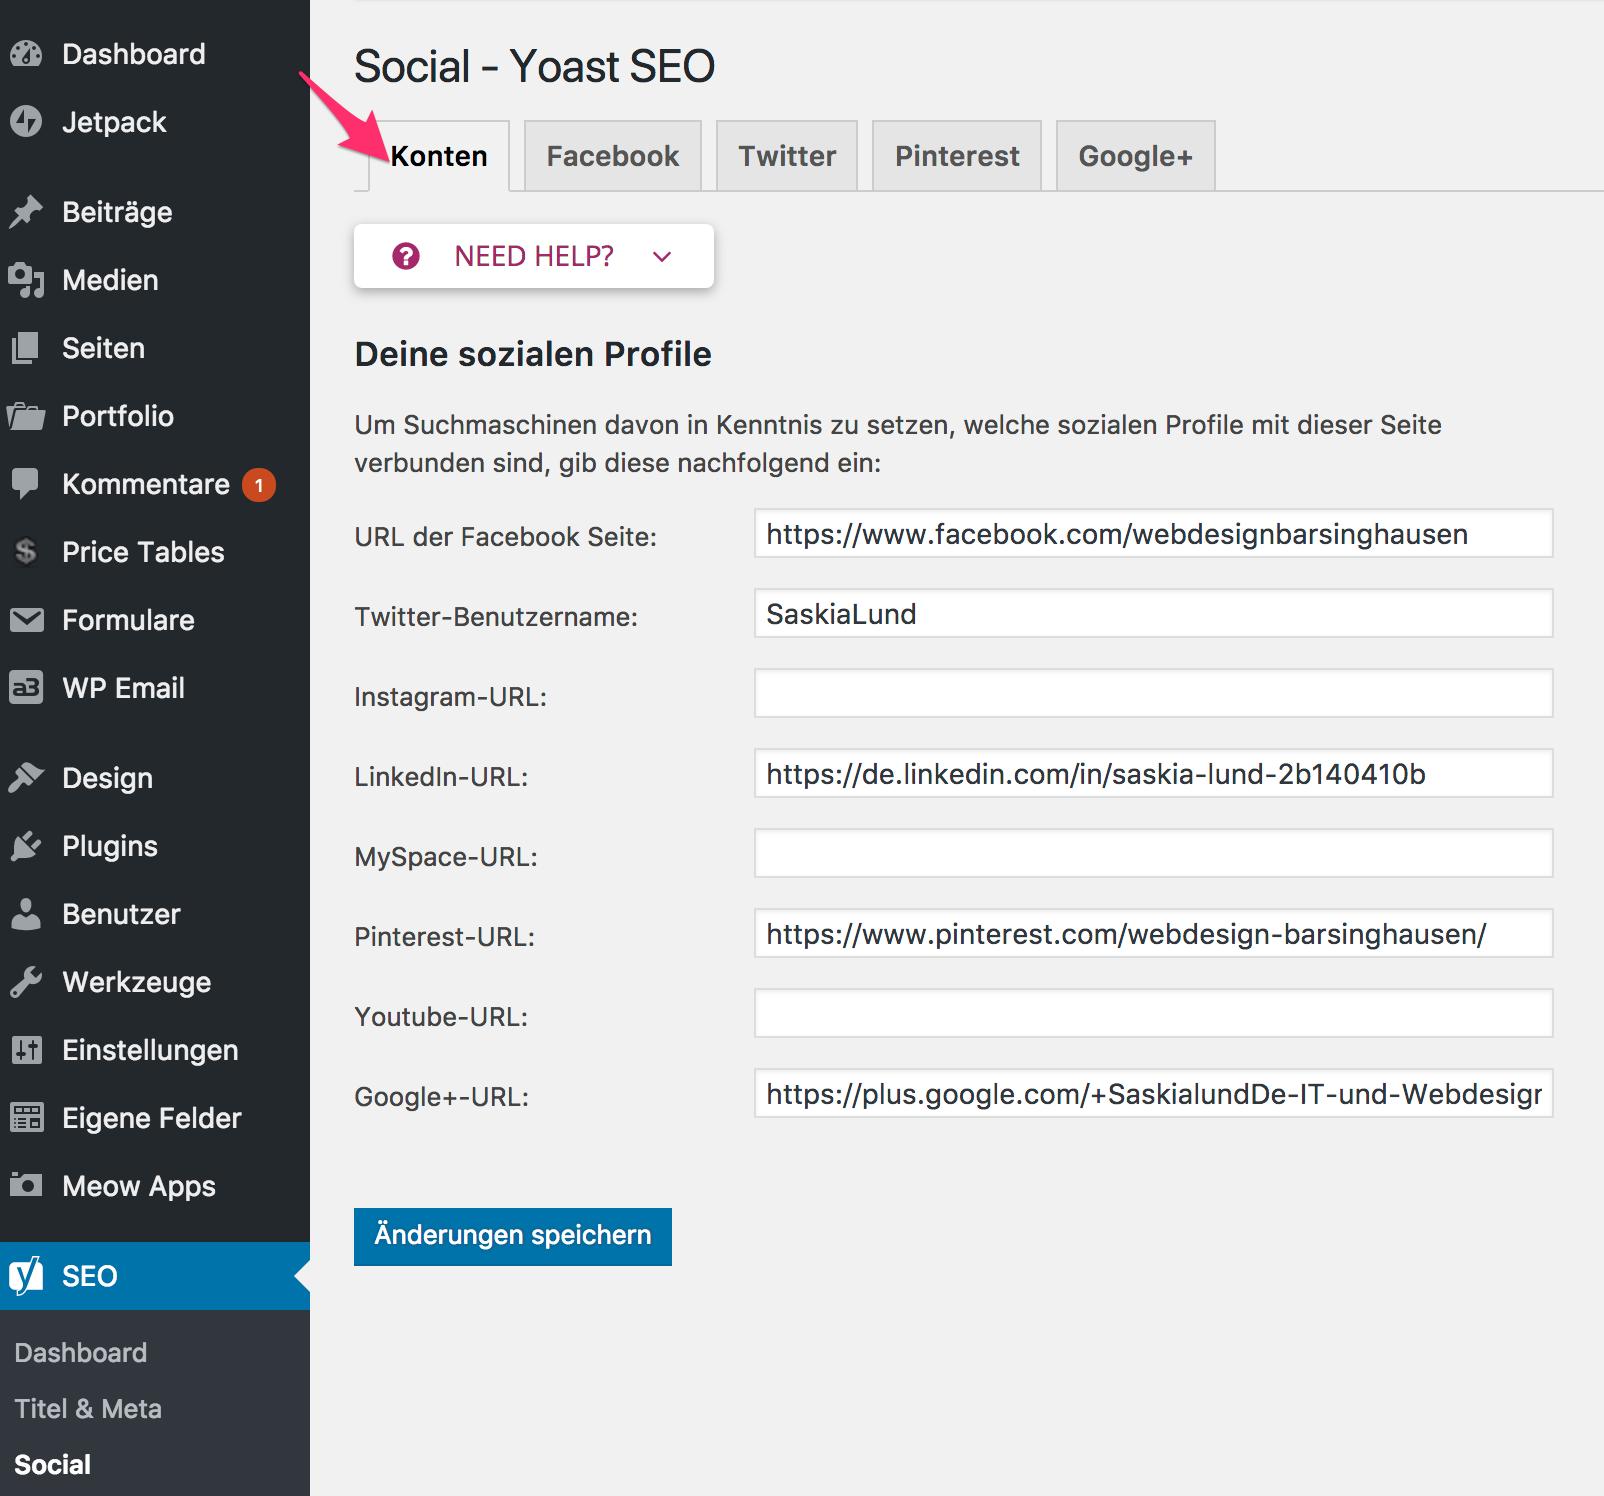 Yoast SEO - Social - Kontent